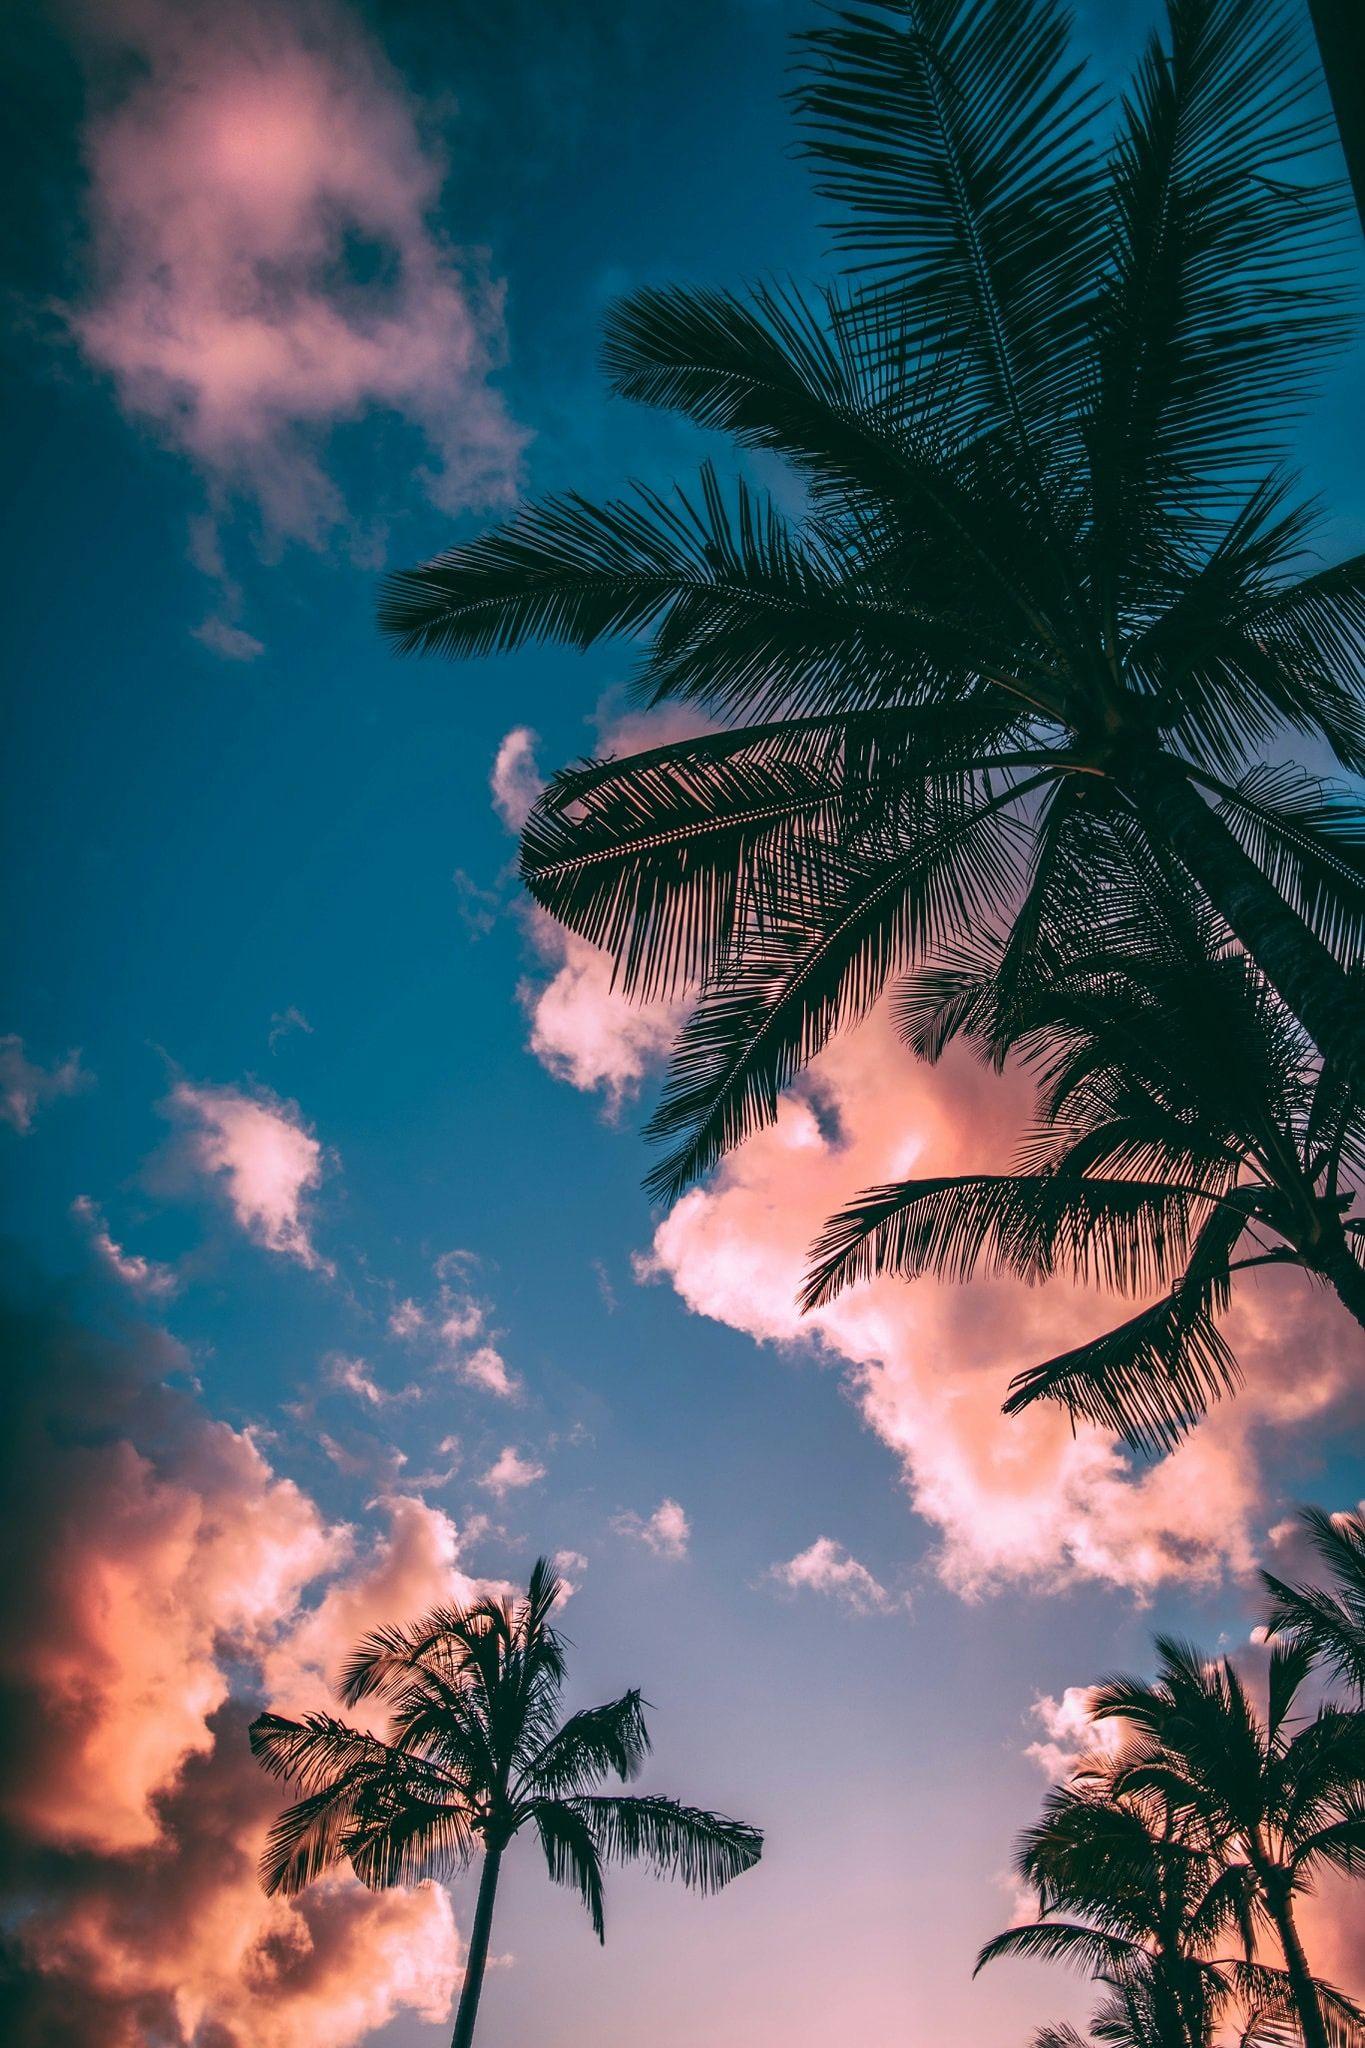 Wallpaper Pink Blue Sky Palmtree Clouds Backgrounds Phone Wallpapers Sunset Wallpaper Beautiful Nature Wallpaper Wallpaper palm trees on blue sky